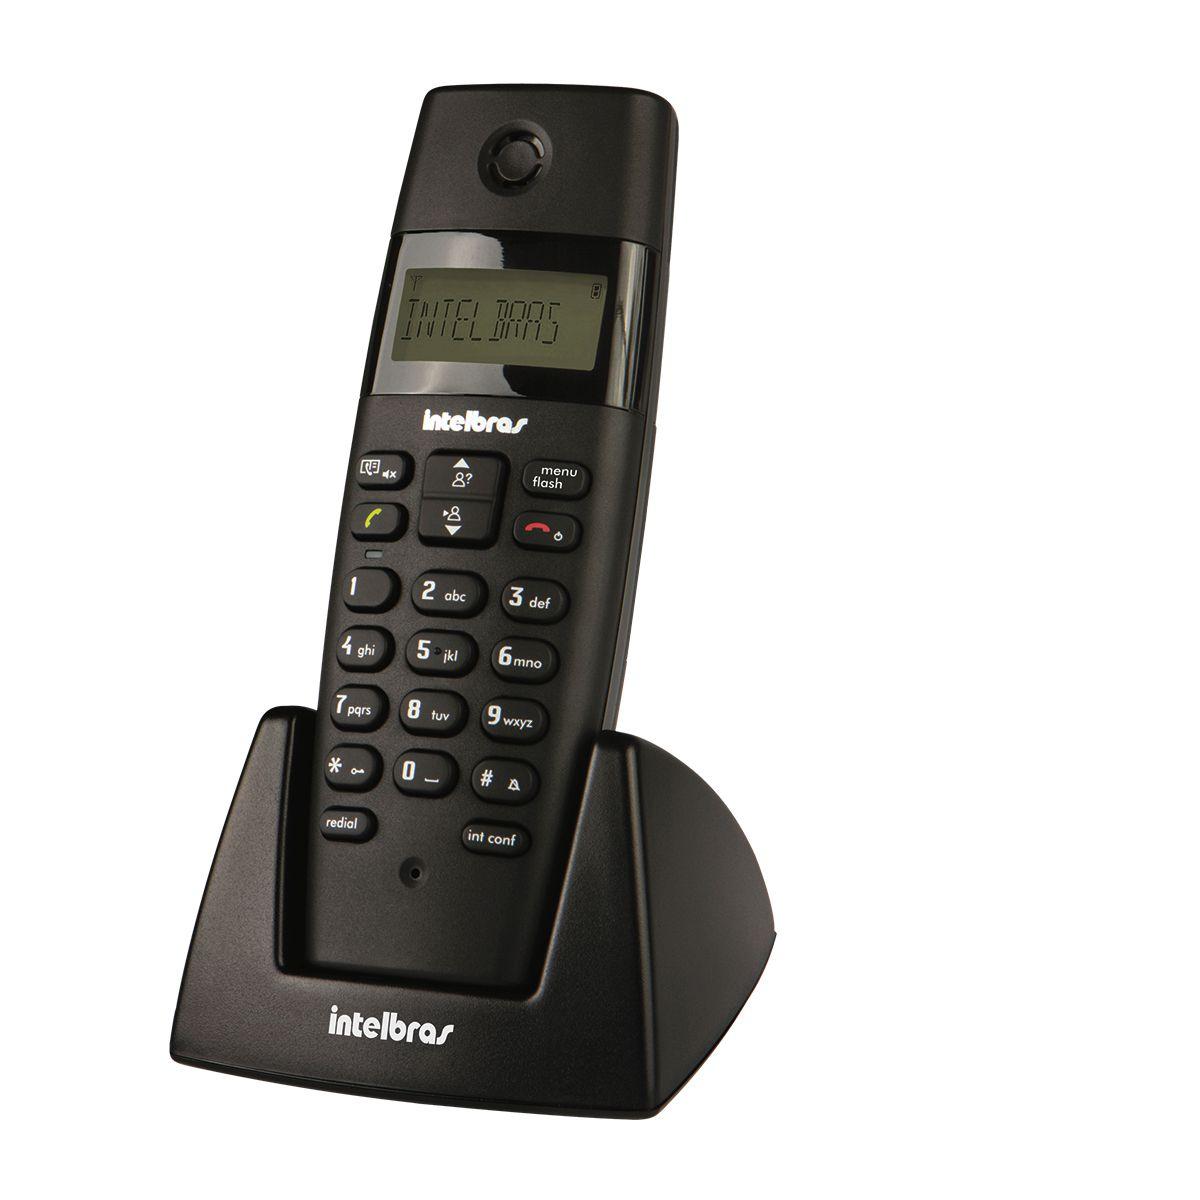 Ramal s/ Fio Digital c / Identificador de Chamadas Intelbras TS40R